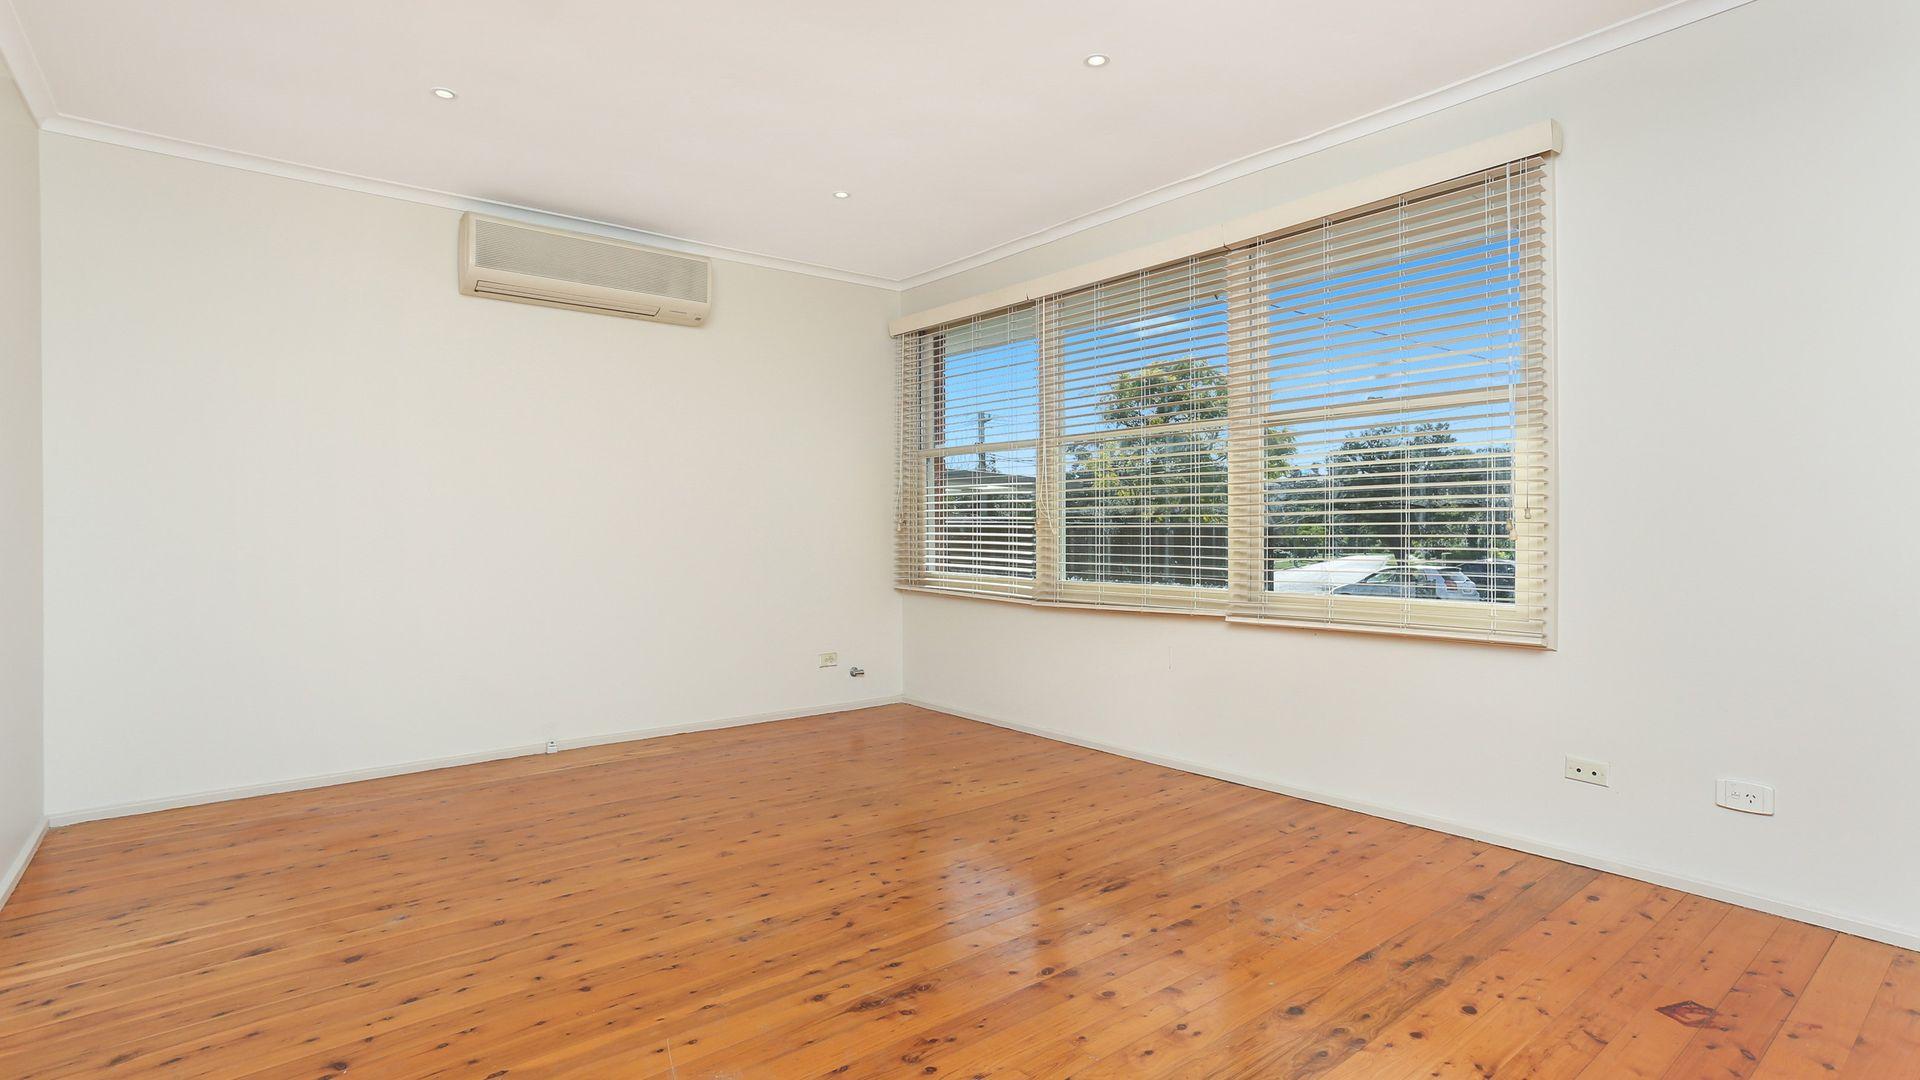 49 Chircan Street, Old Toongabbie NSW 2146, Image 2